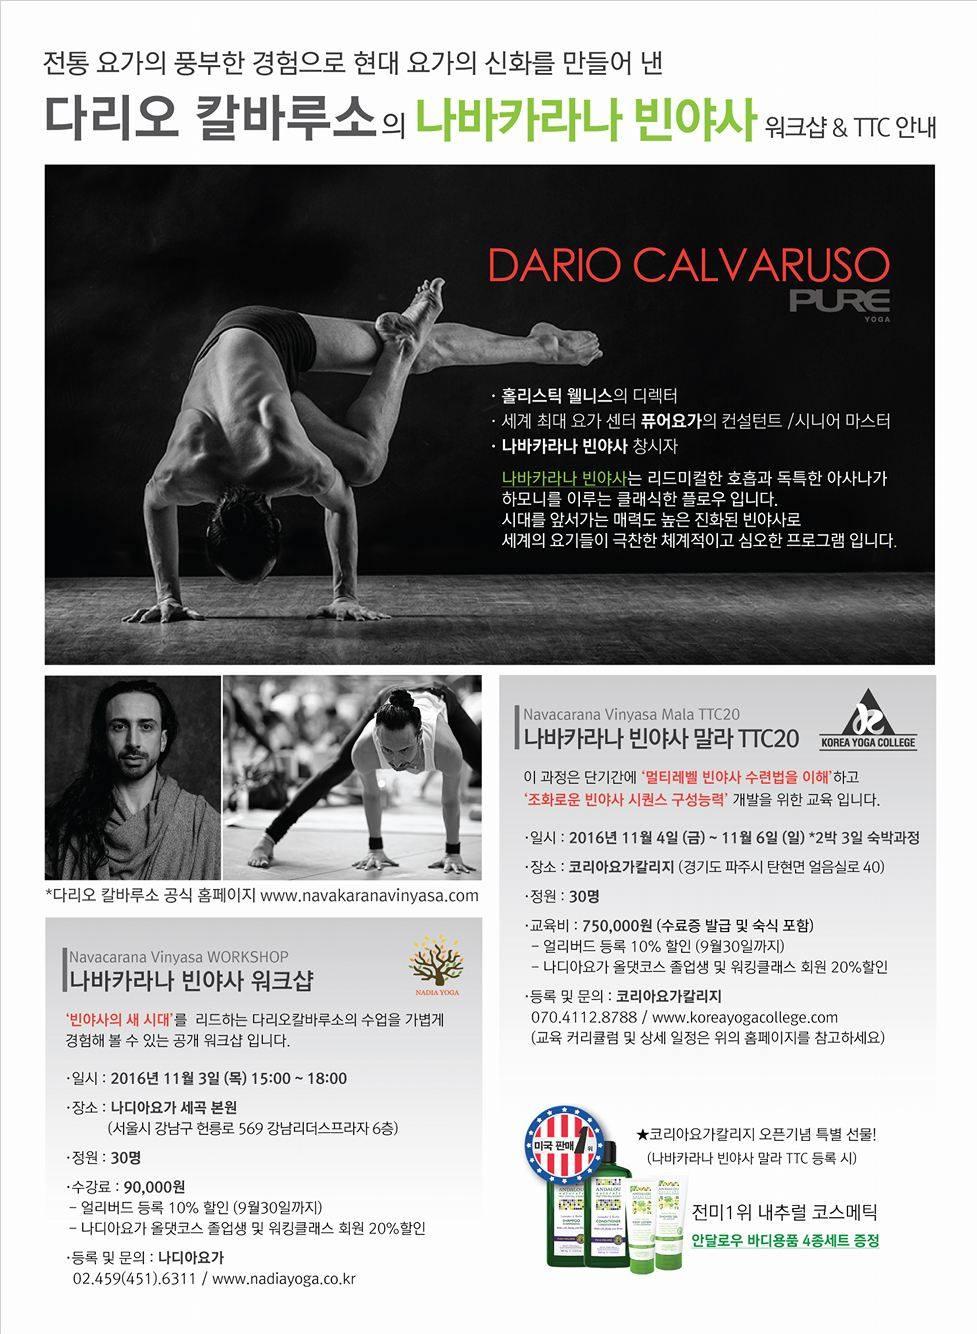 dario-calvaruso-navakarana-04-06nov2016-south-korea-programme